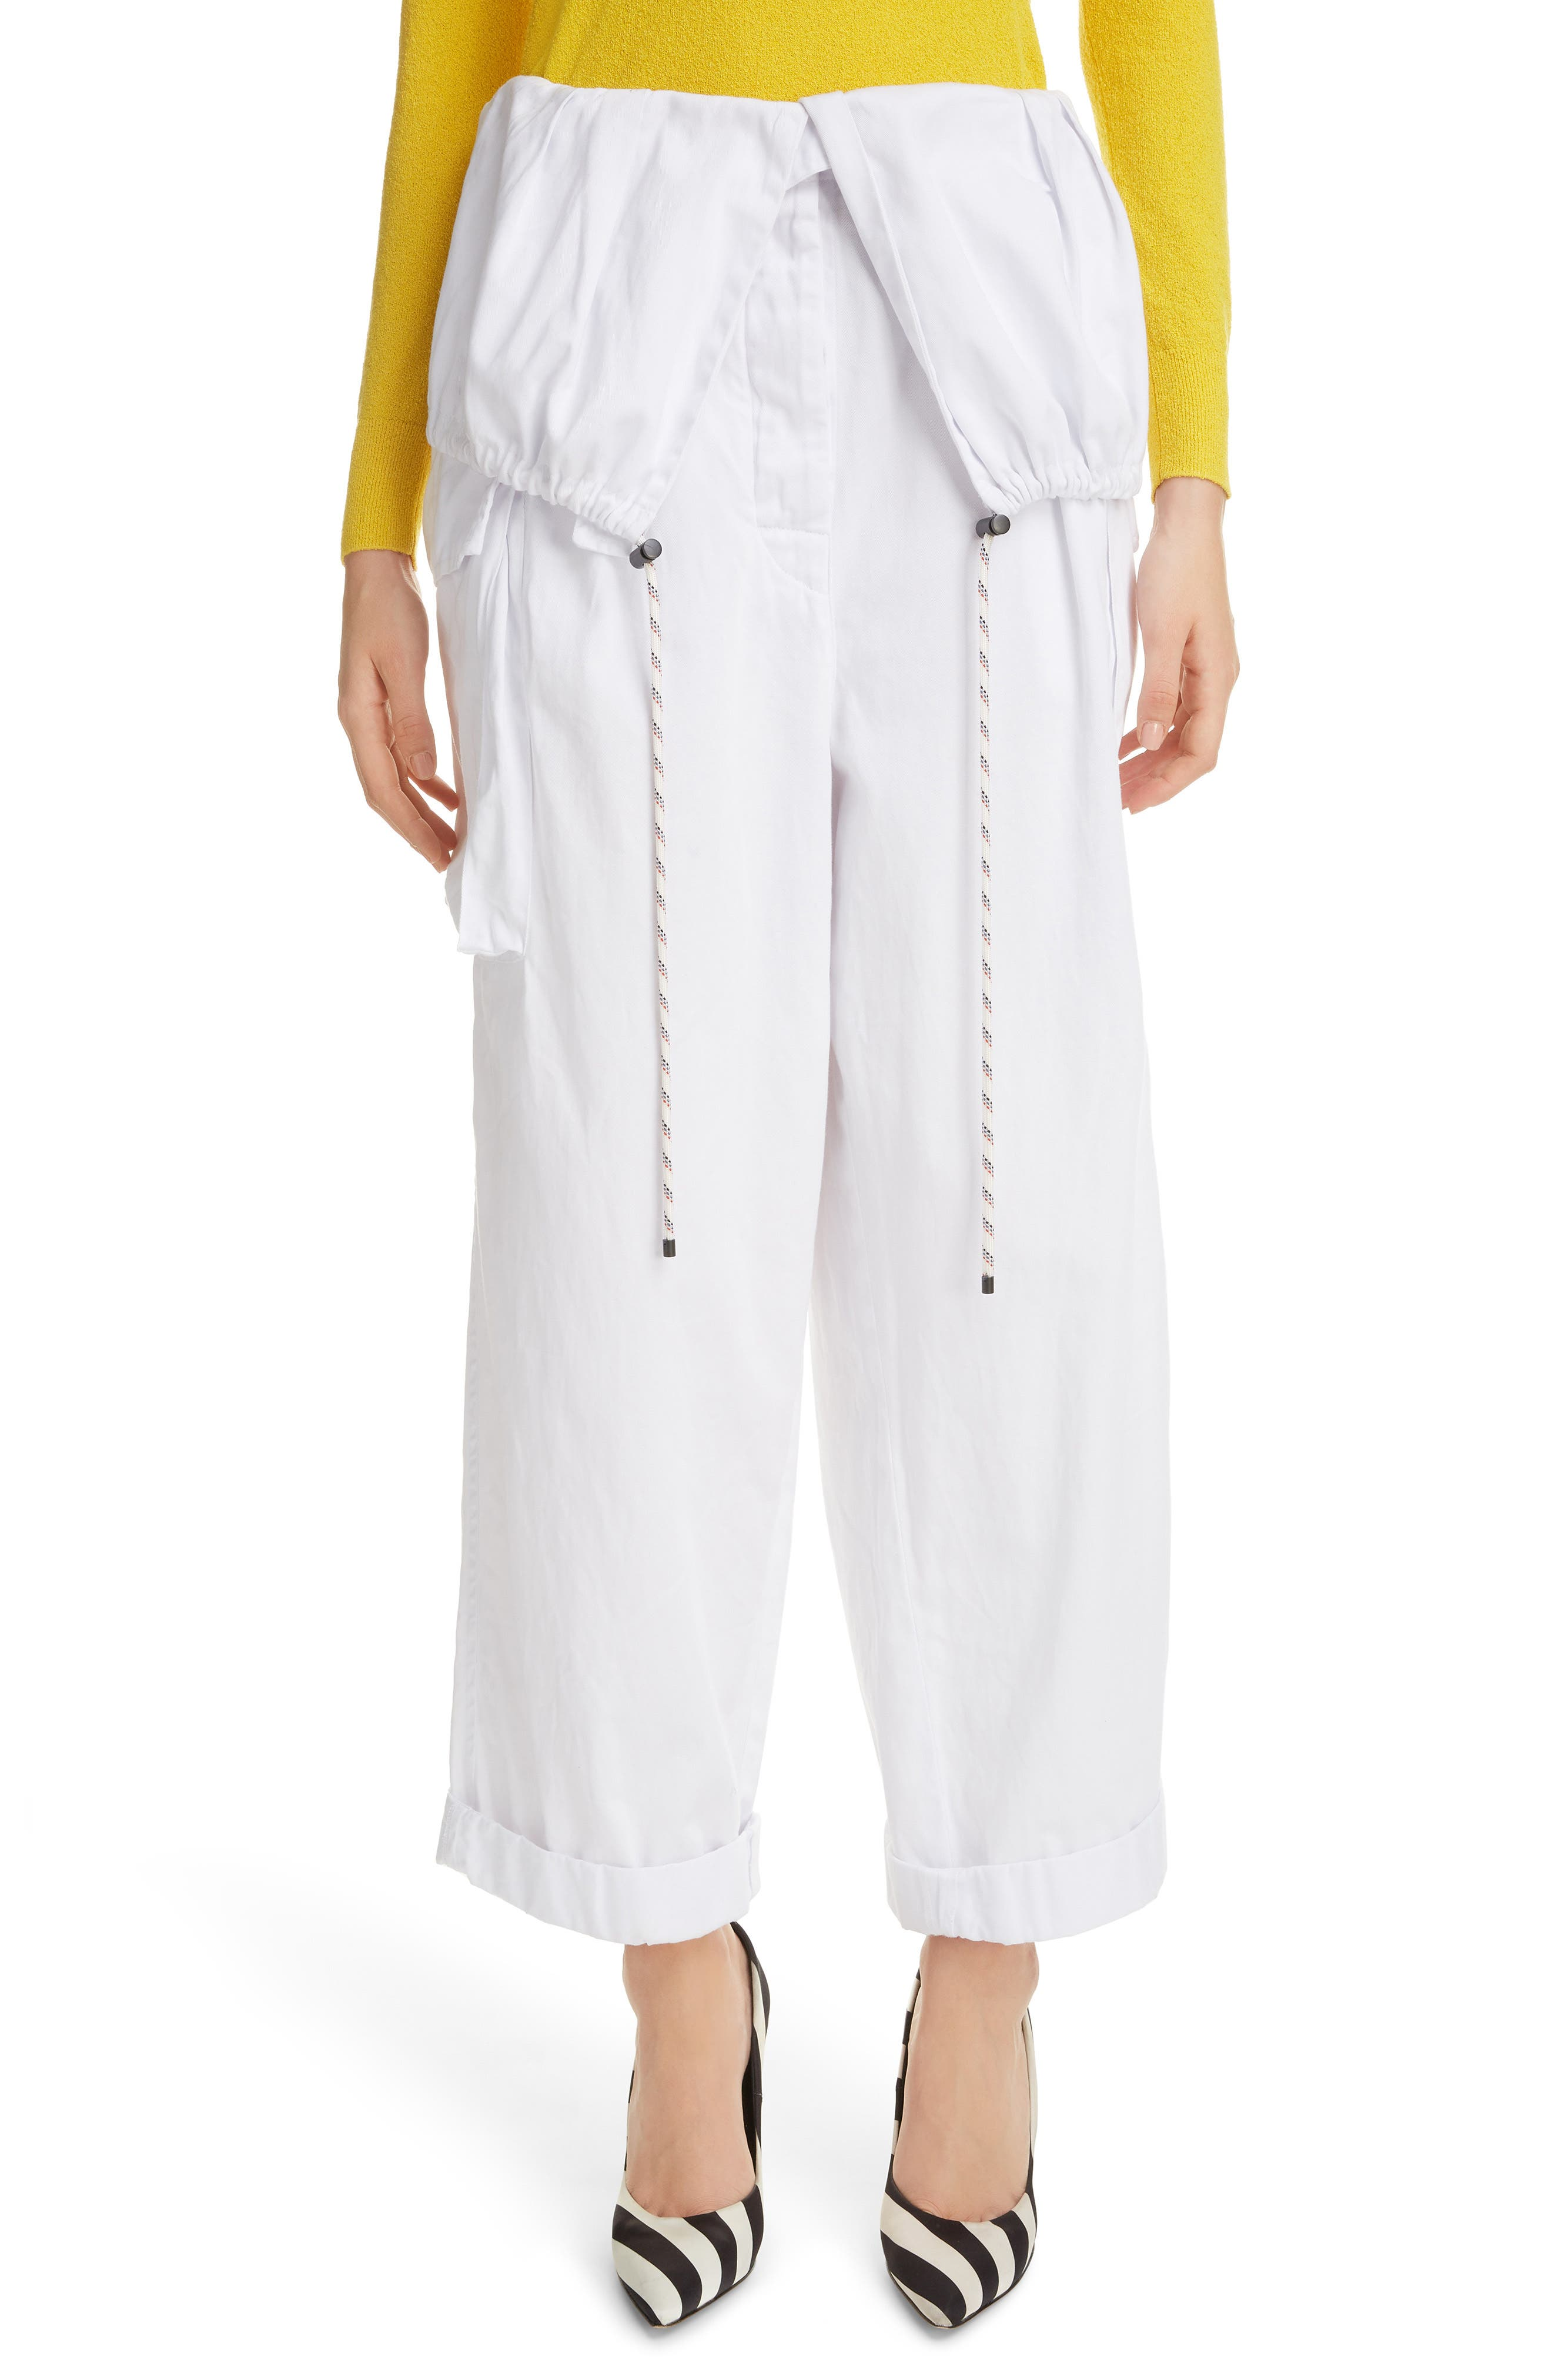 Dries Van Noten Pavel Cotton Ankle Cargo Pants, US / 44 FR - White